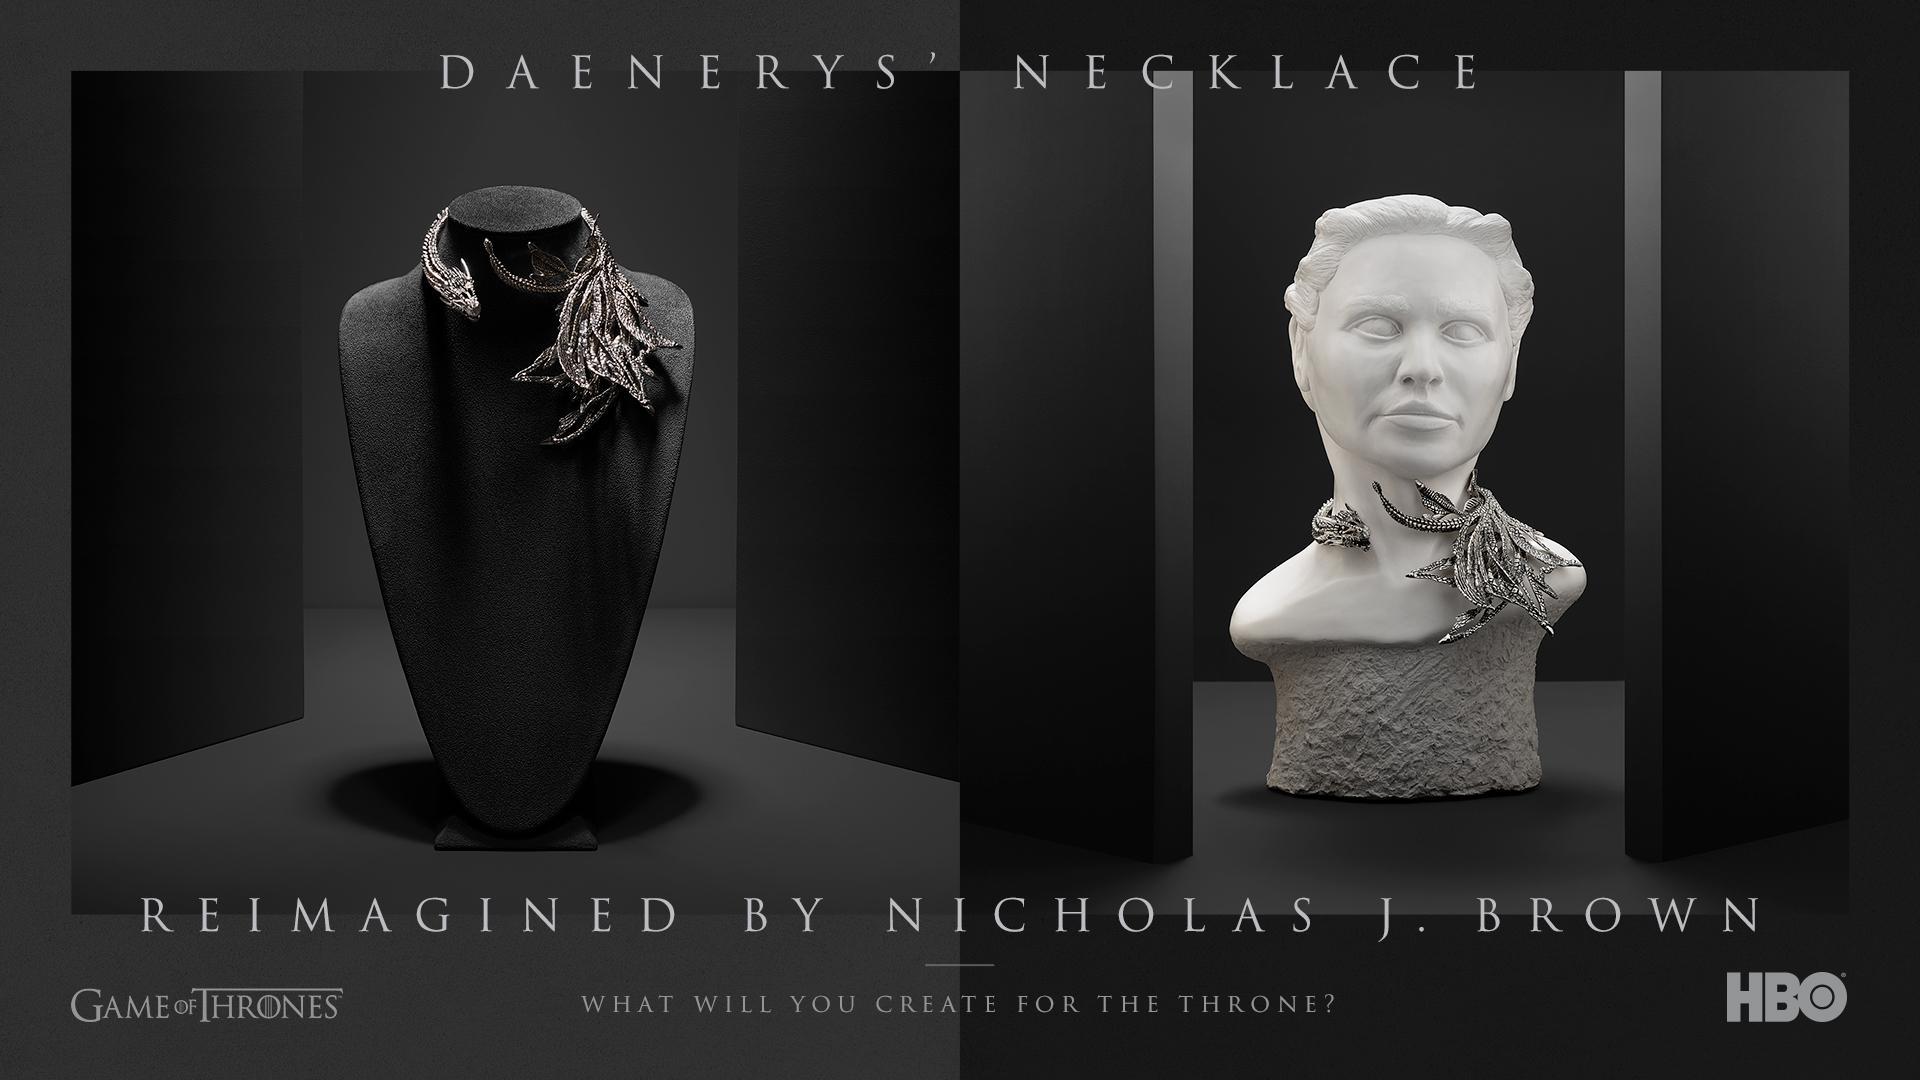 15_FASHION_Daenerys_Necklace_Nicholas_J_Brown.jpg